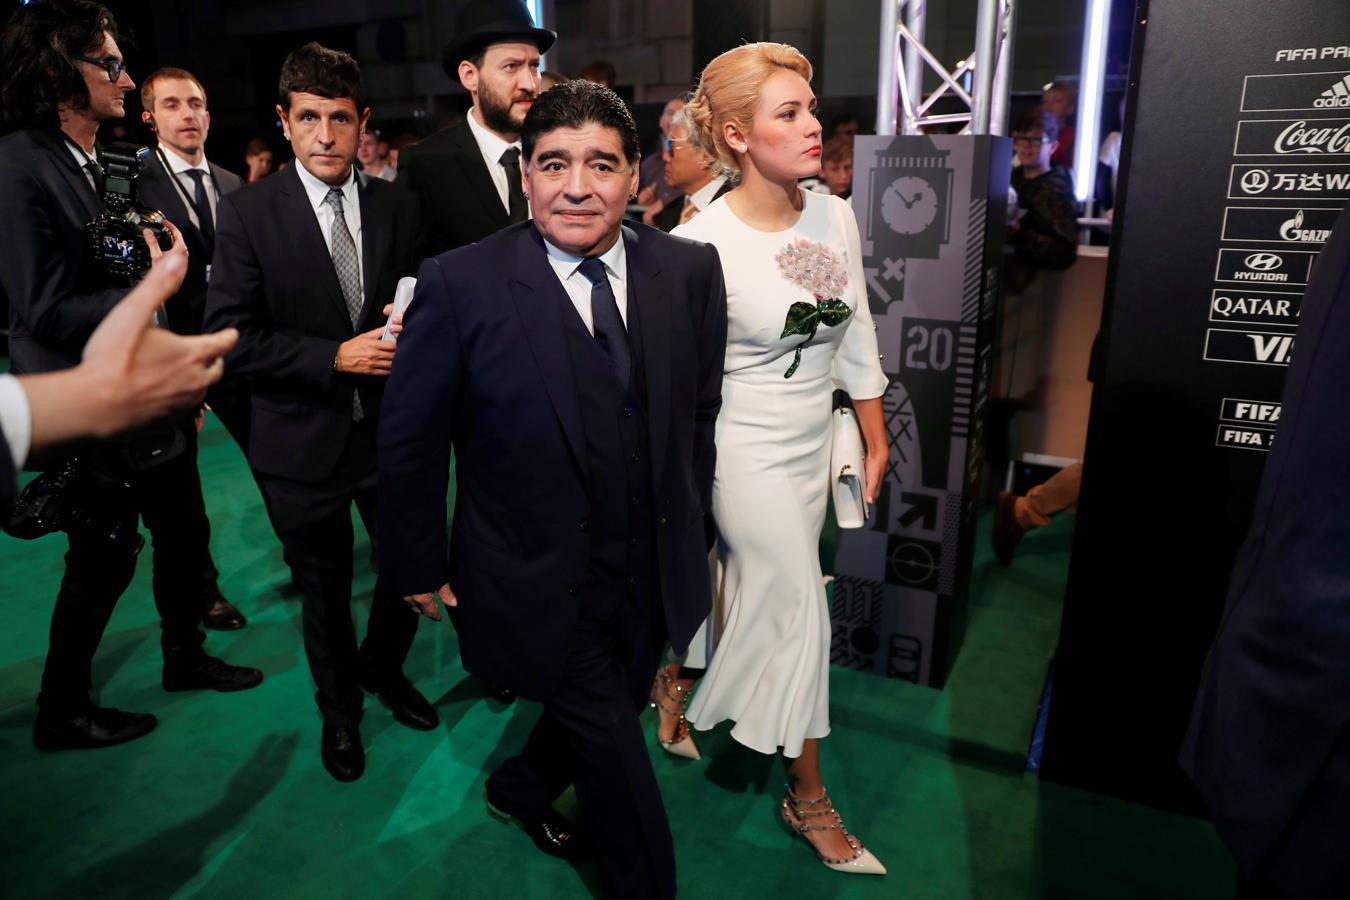 Diego Maradona y su mujer, Rocío Oliva